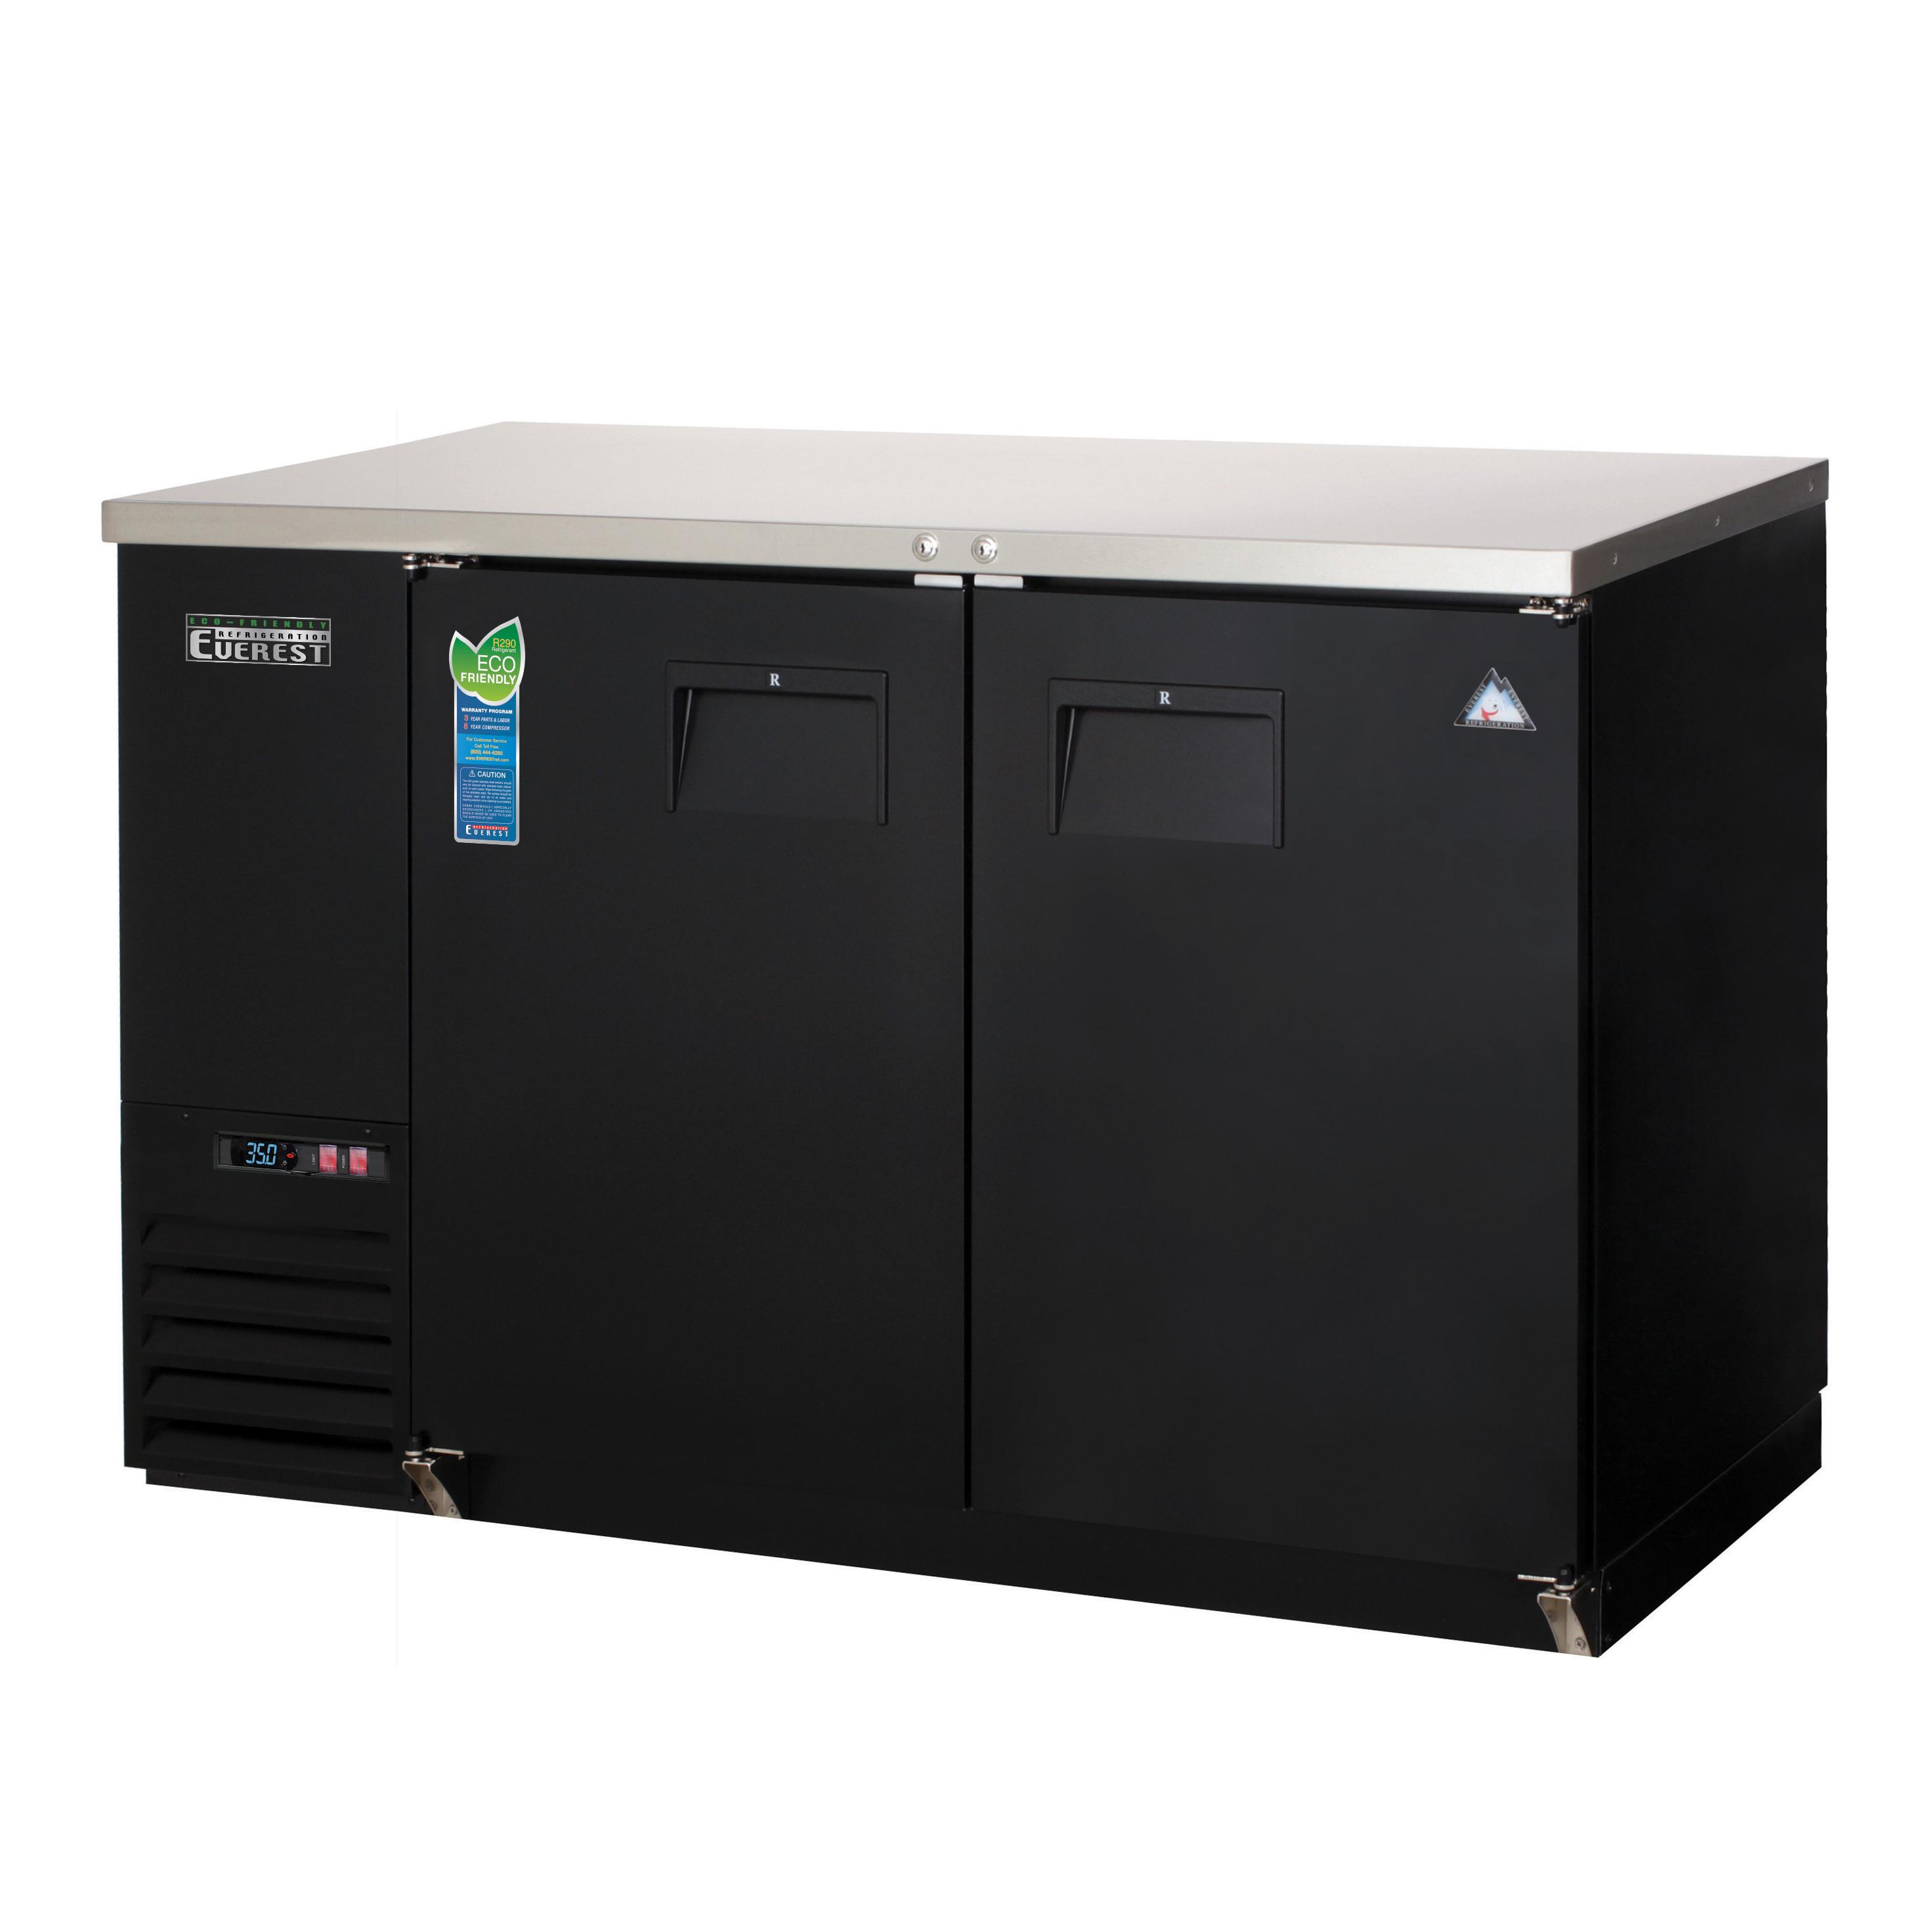 Everest Refrigeration EBB48-24 back bar cabinet, refrigerated